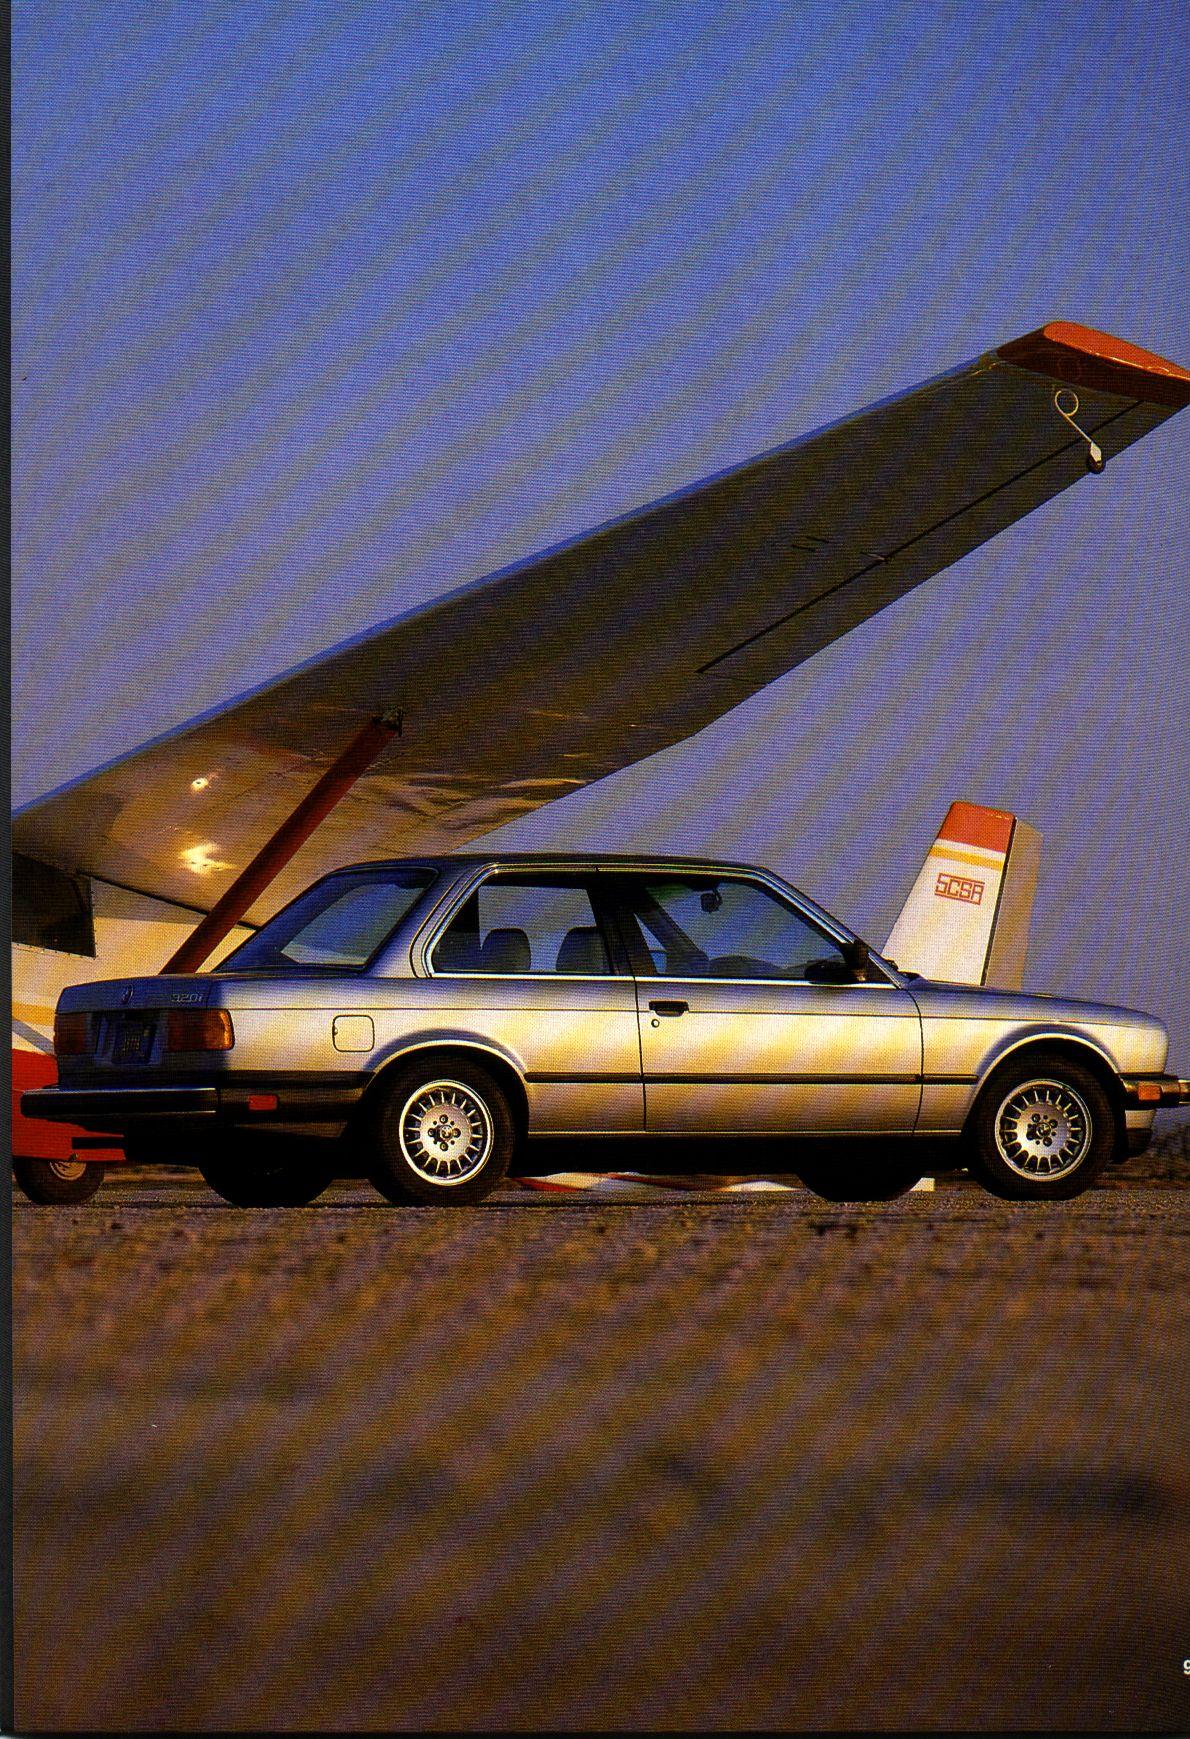 1984 bmw 3 series brochure bmw 3 series manual transmission issues bmw 3 series manual download